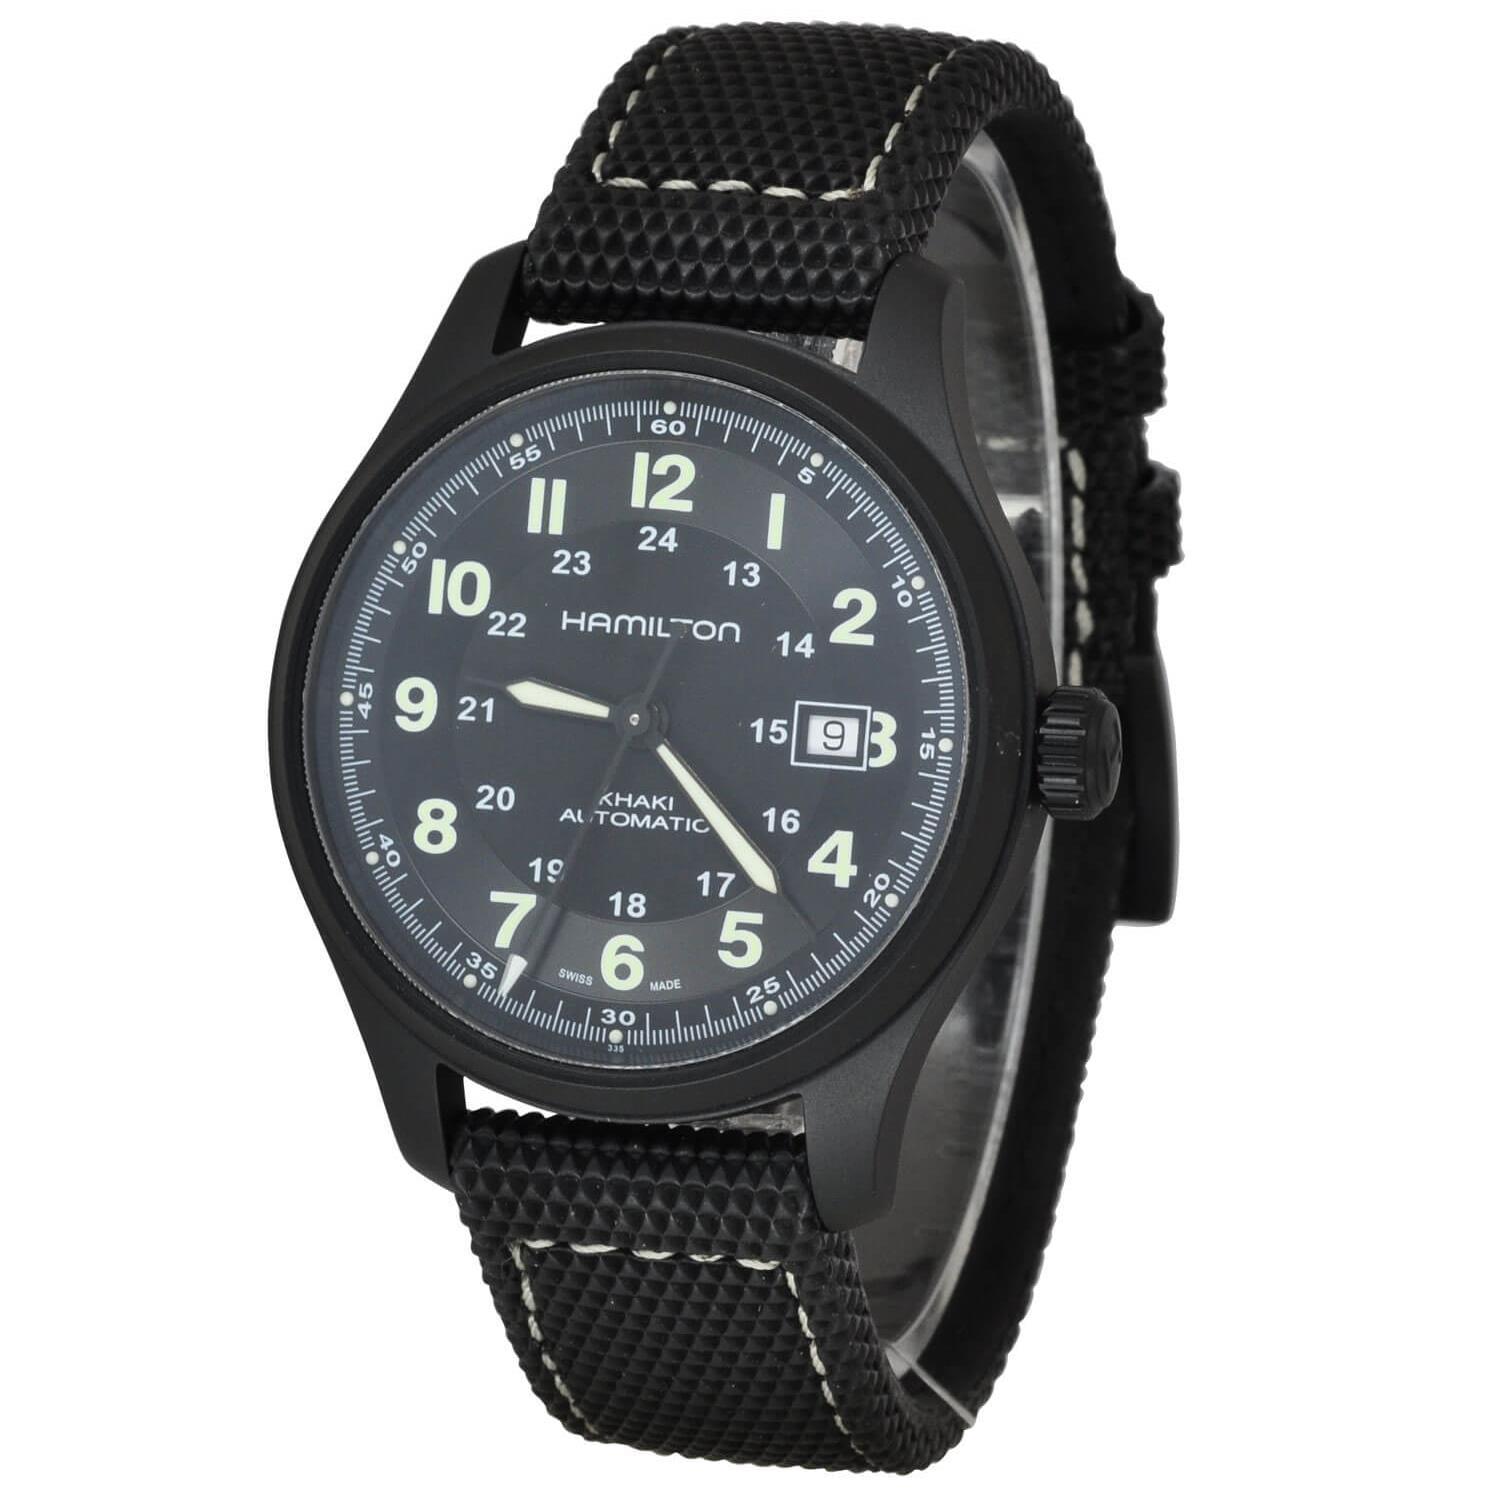 Hamilton Men's Khaki Field Titanium 42mm Black Canvas Band Titanium Case Automatic Analog Watch H70575733 by Hamilton